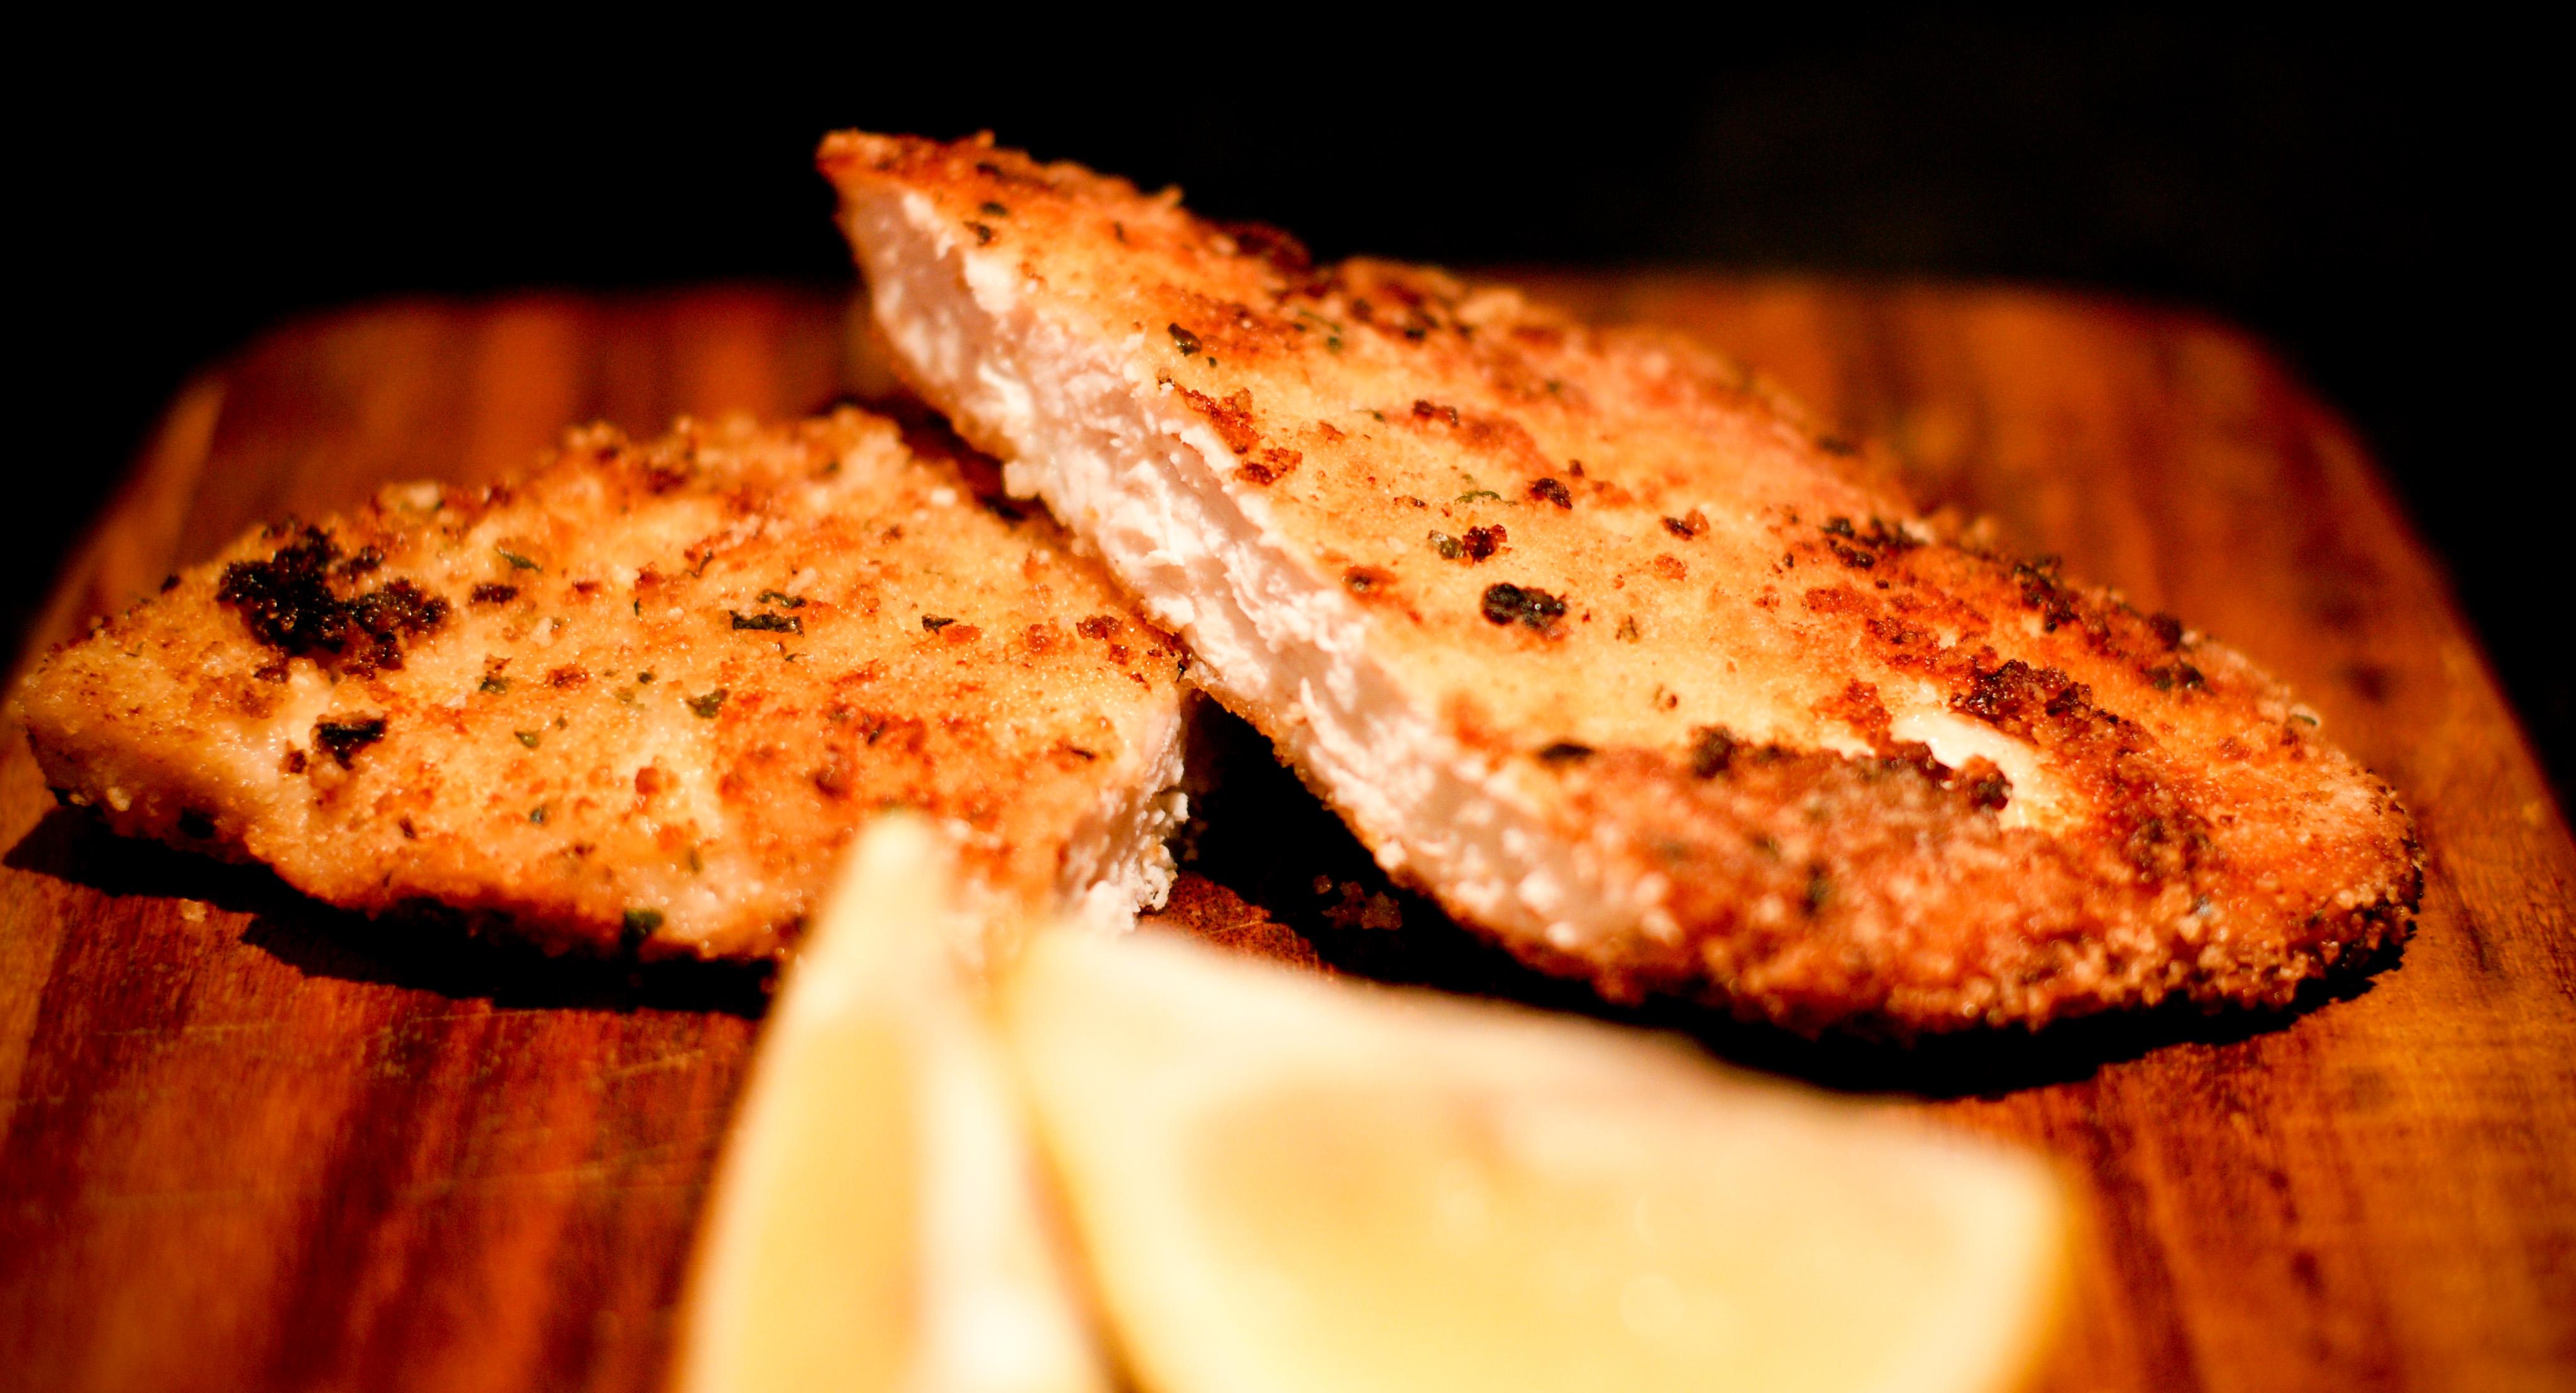 Lemon & Parsley Chicken Schnitzel with Garlic Coleslaw   The ...